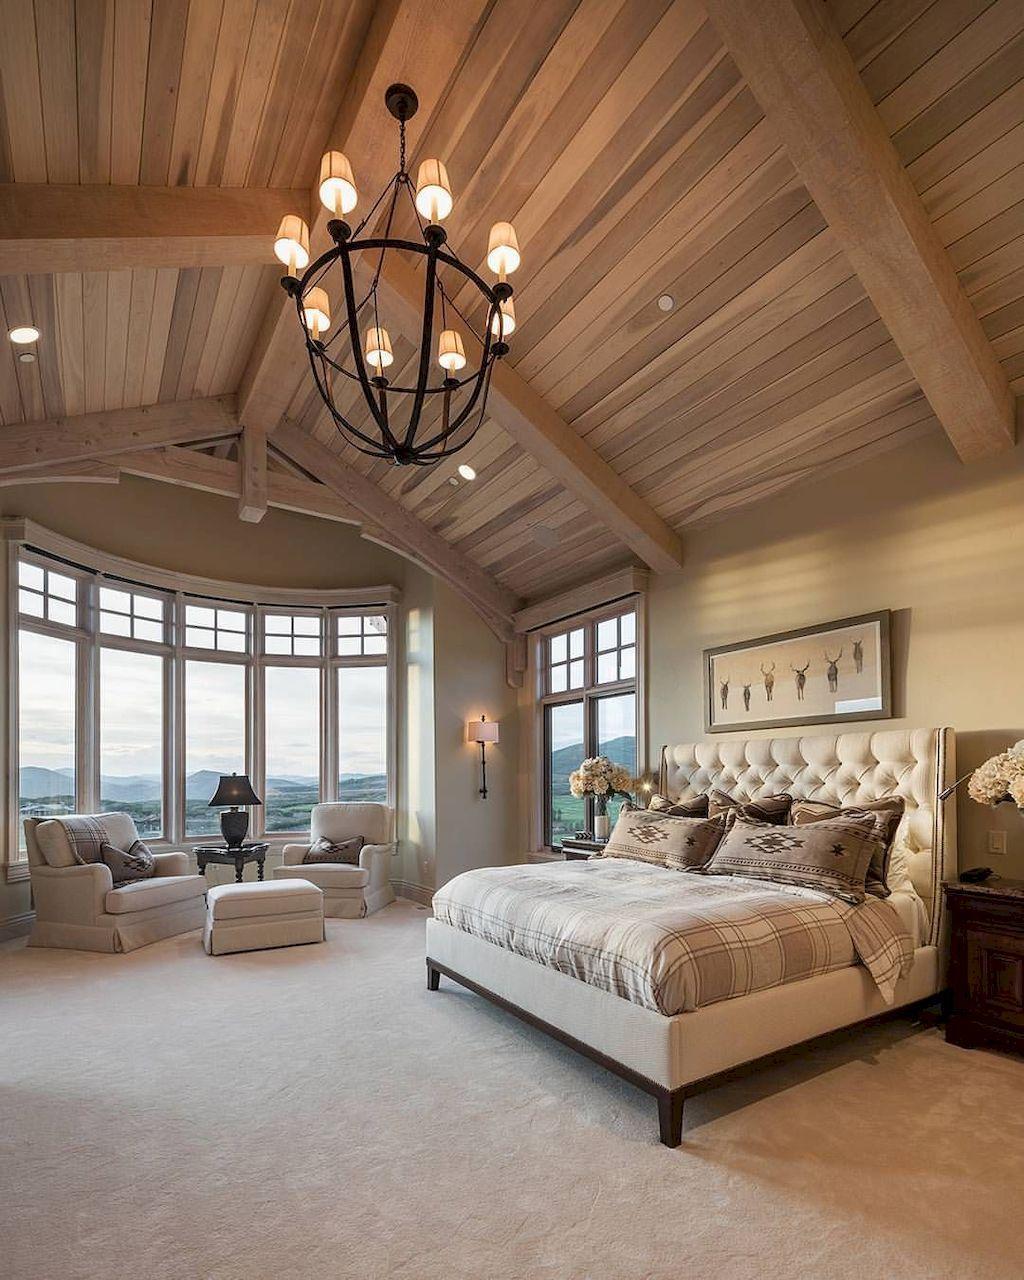 75 Rustic Coastal Master Bedroom Ideas Setyouroom Com Home Decor Bedroom Coastal Master Bedroom Master Bedroom Design